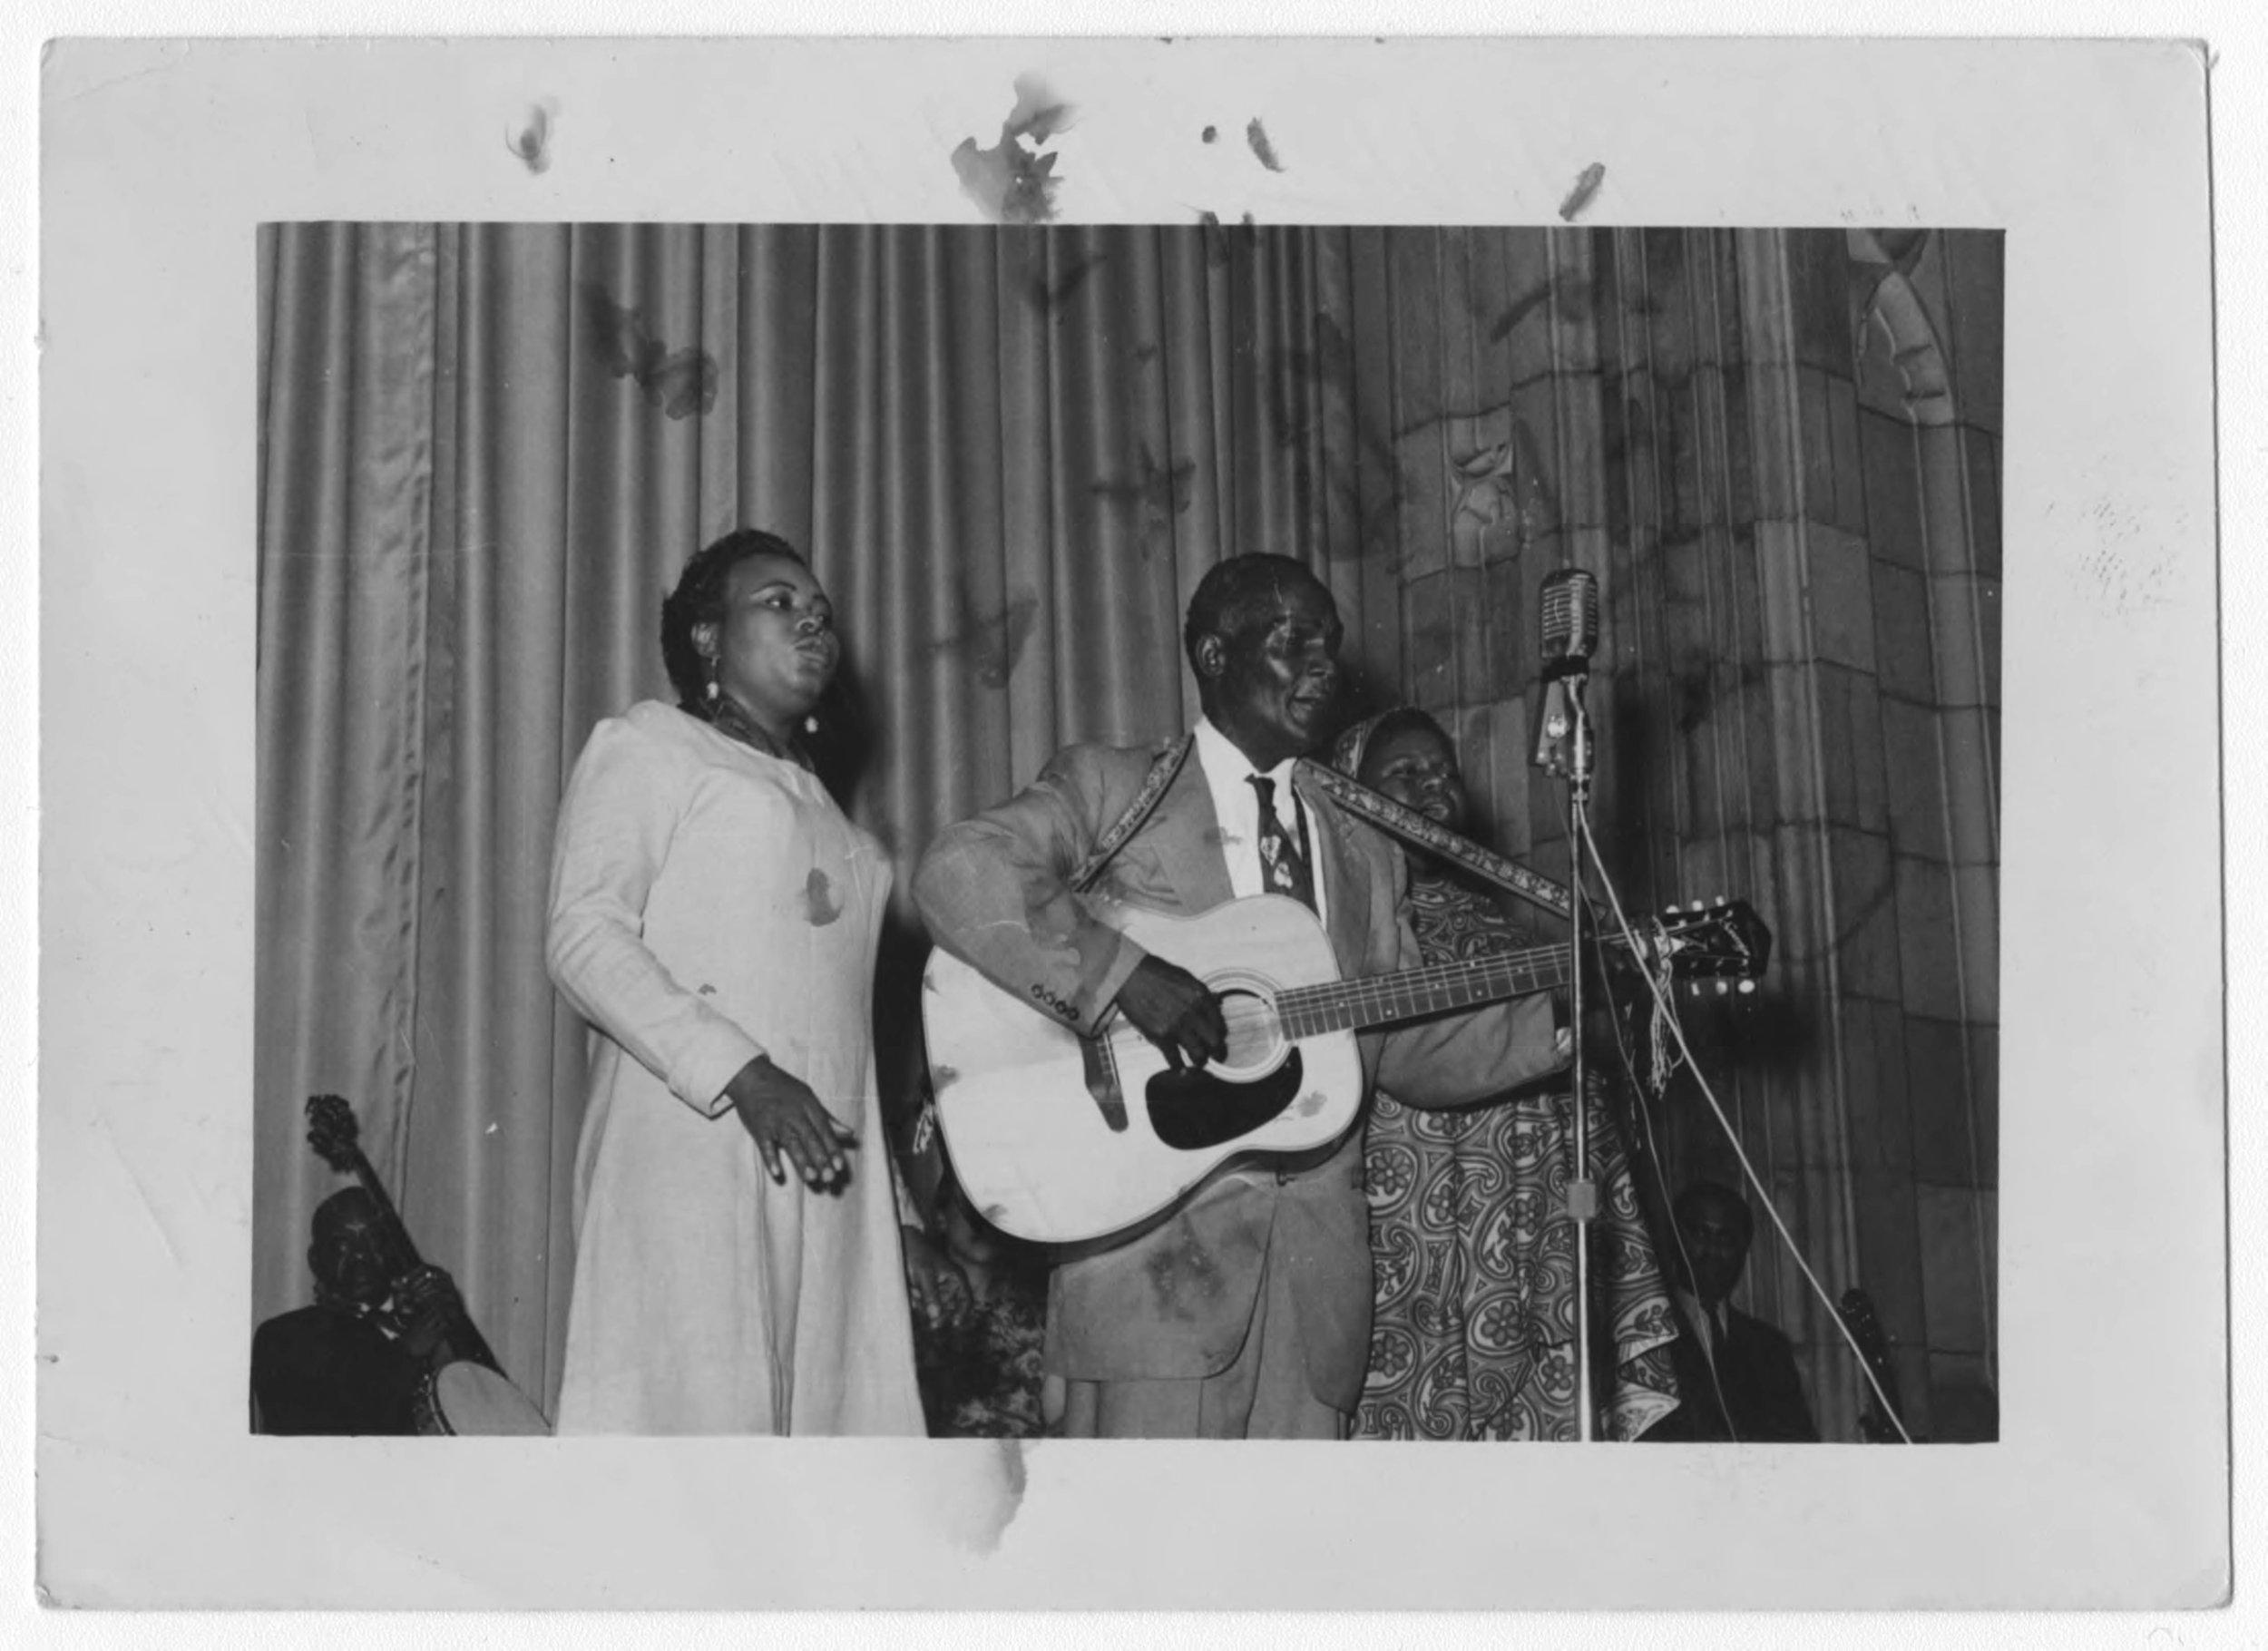 Image_2813_Miss_Mable_Hillery_Reverend_Pearly_Brown_Miss_Bernice_Reagon_taken_in_Vanderbilt_Concert_April_1966_Nashville_Tenn_Scan_1.jpg